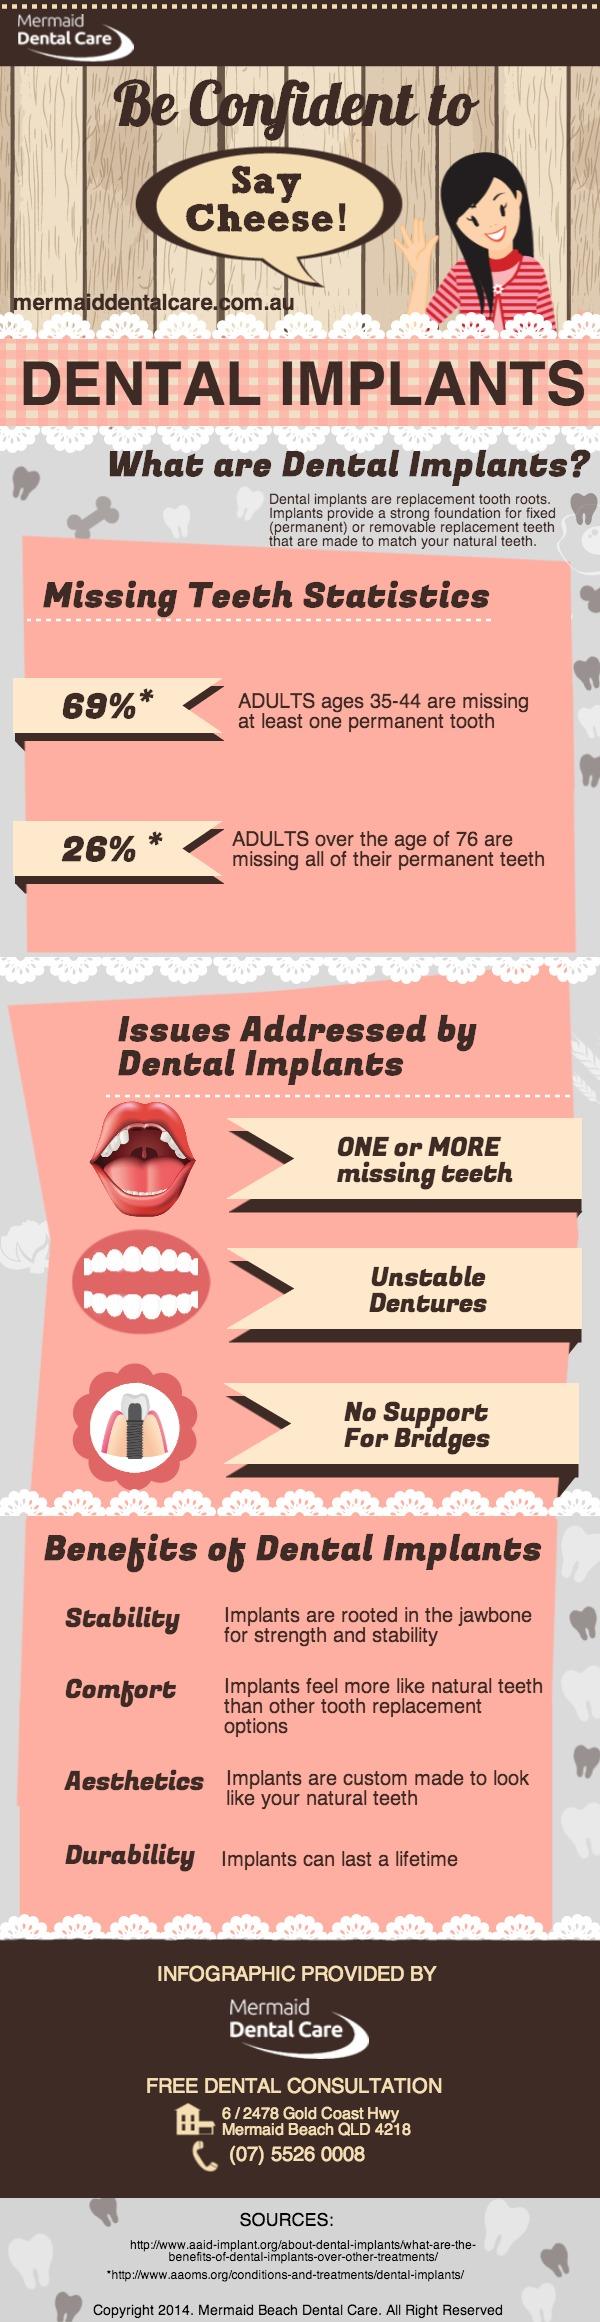 Permanent Gold Teeth Implants : permanent, teeth, implants, Dentist, Coast, Camera, Ready, Smile, Dental, Implants, Implants,, Implant, Dentist,